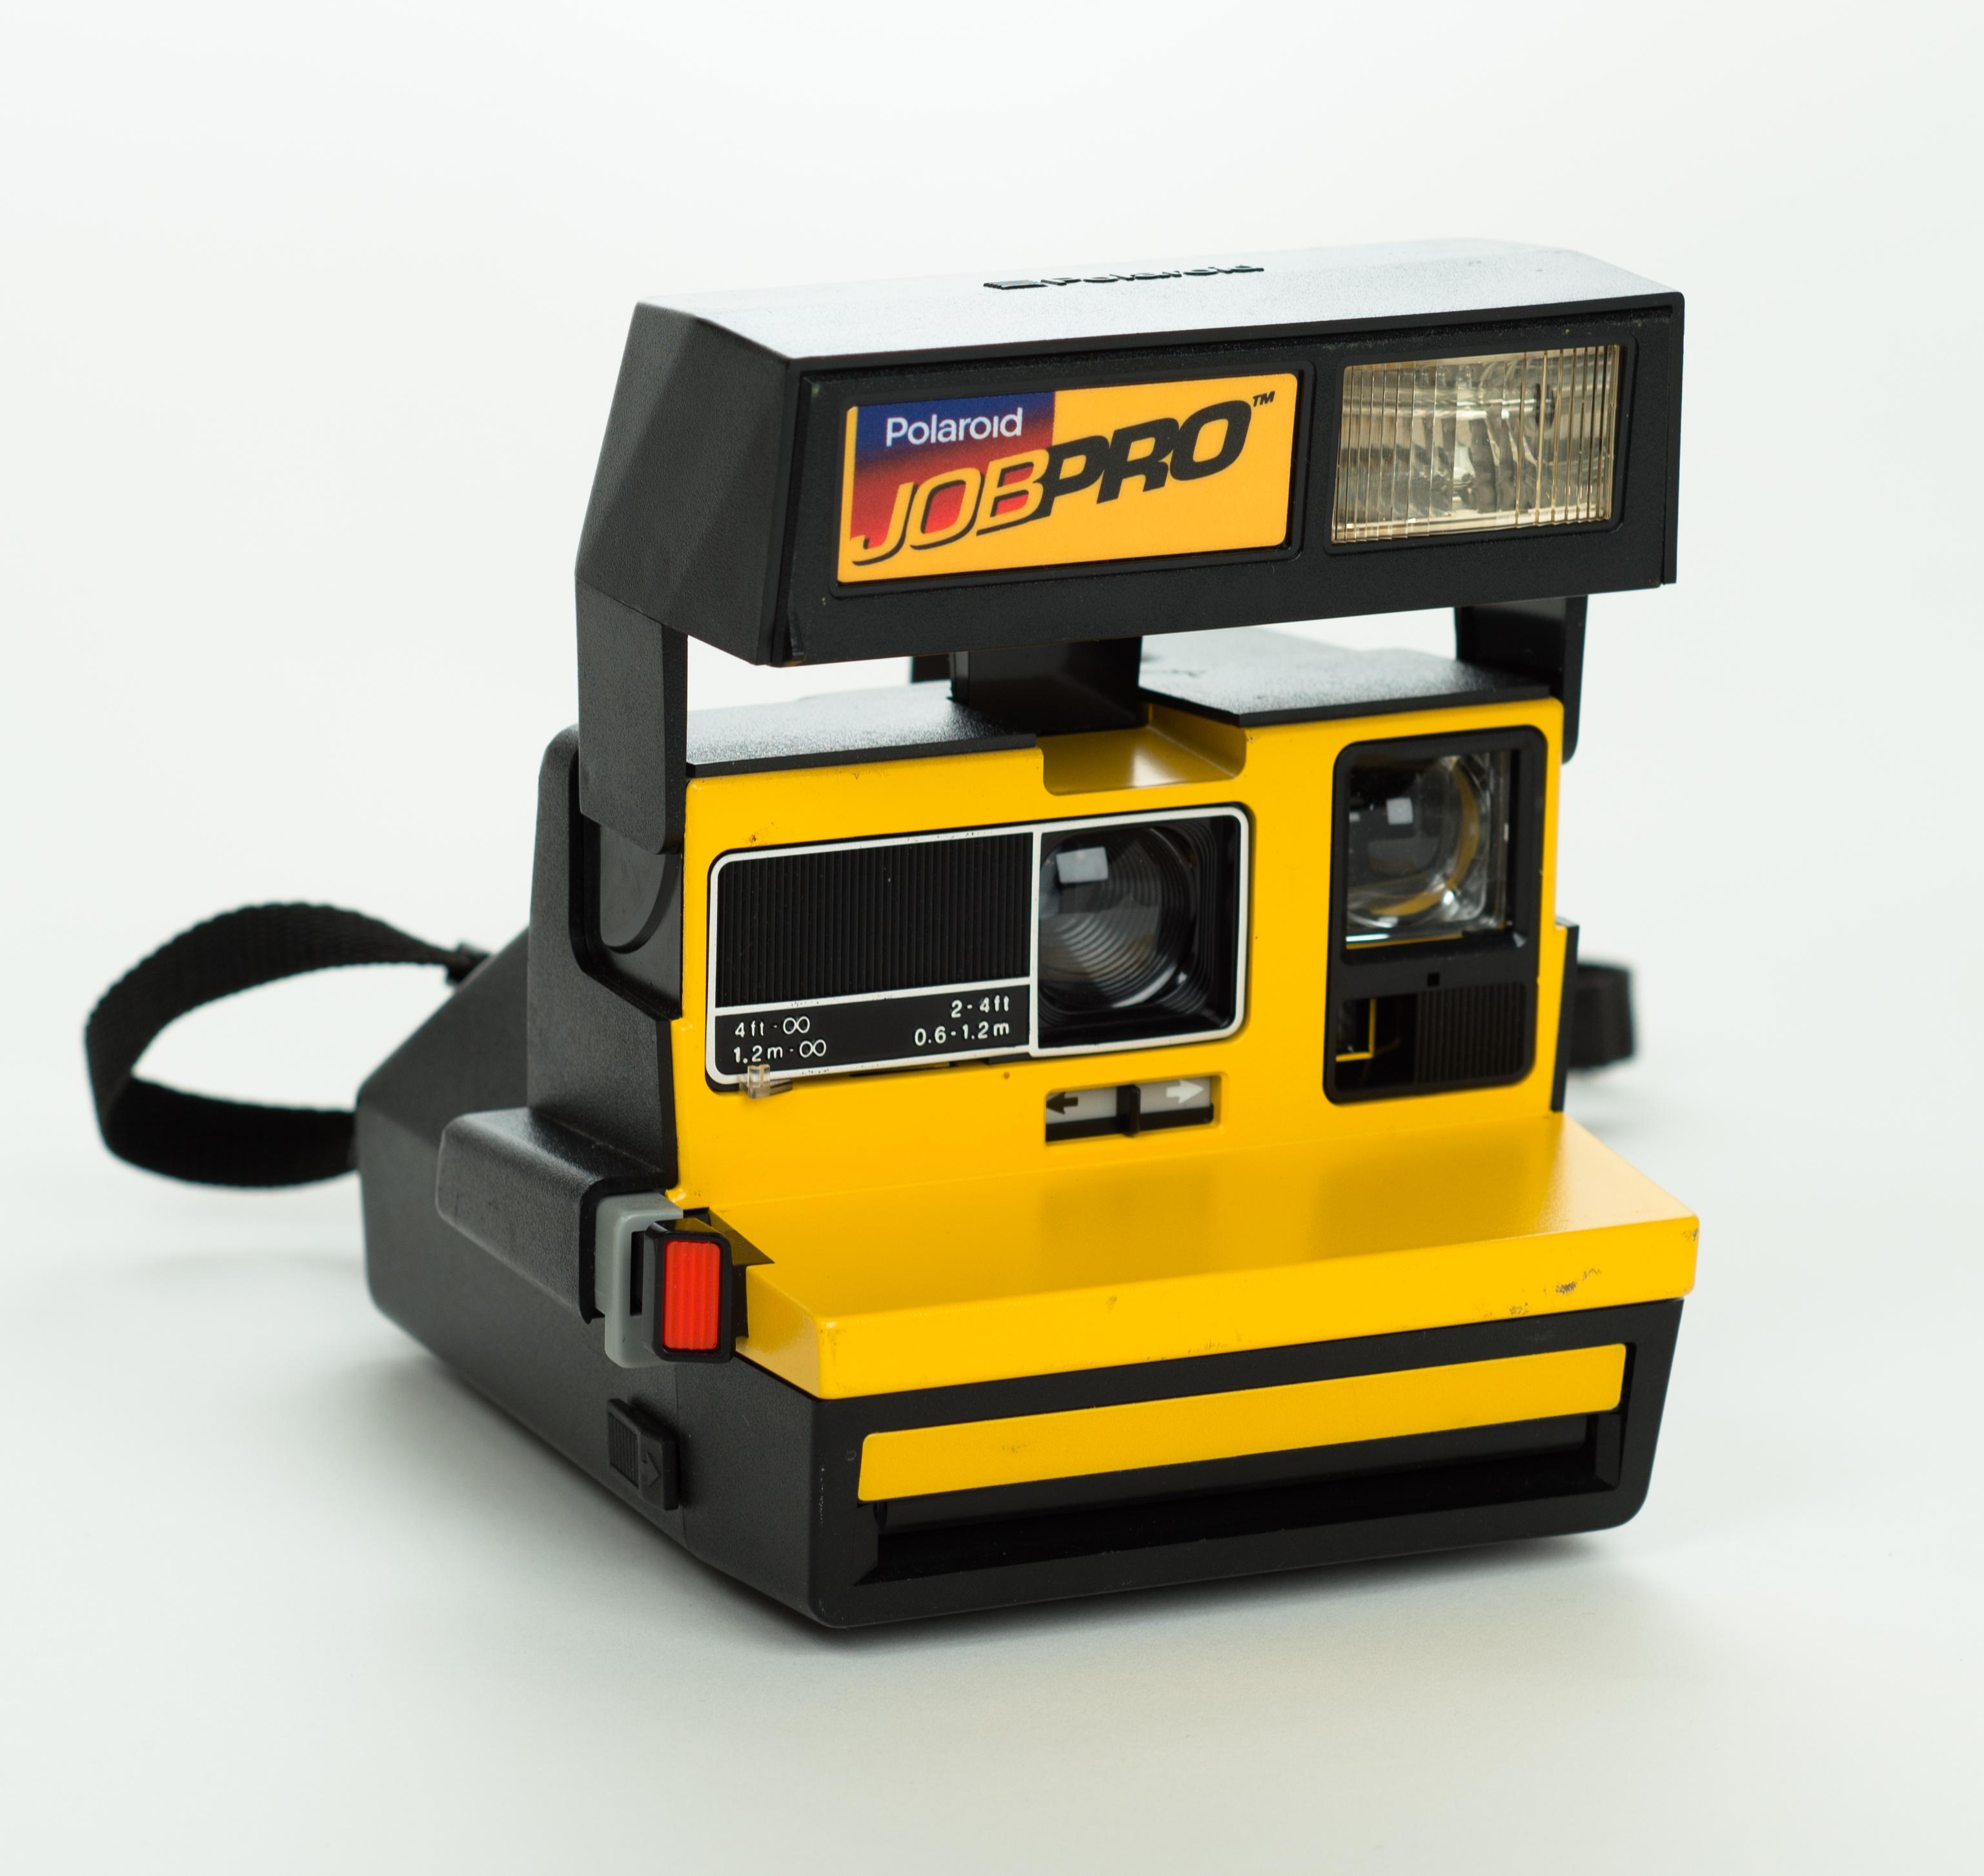 polaroid job pro 600 camera review rh danfinnen com Polaroid Job Pro Manual Polaroid Job Pro Manual